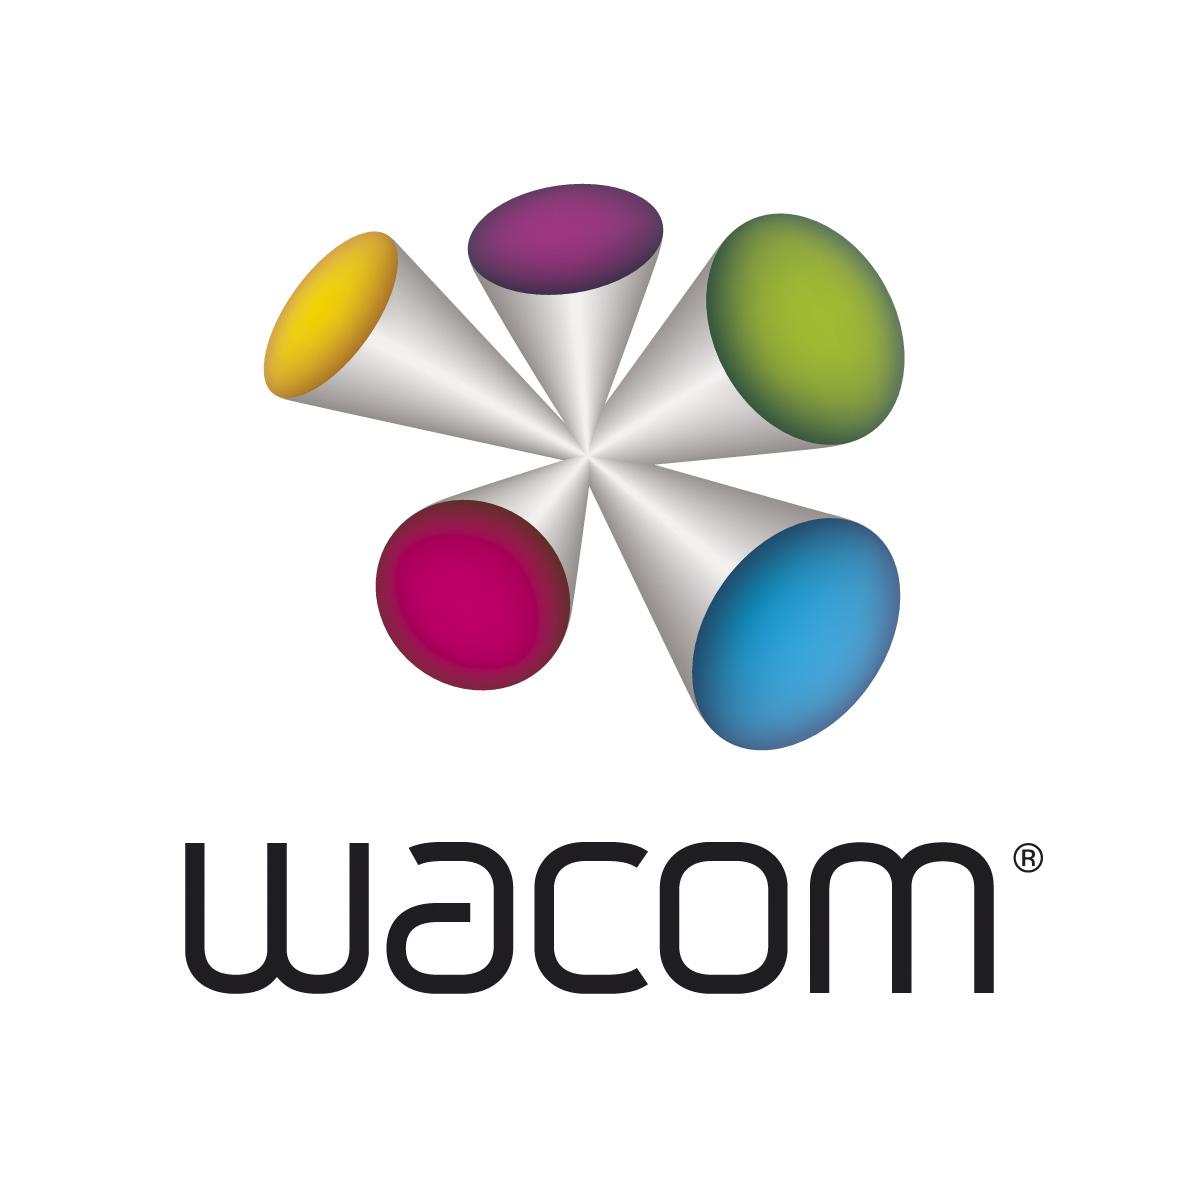 wacom_logo_nb_c cópia.JPG